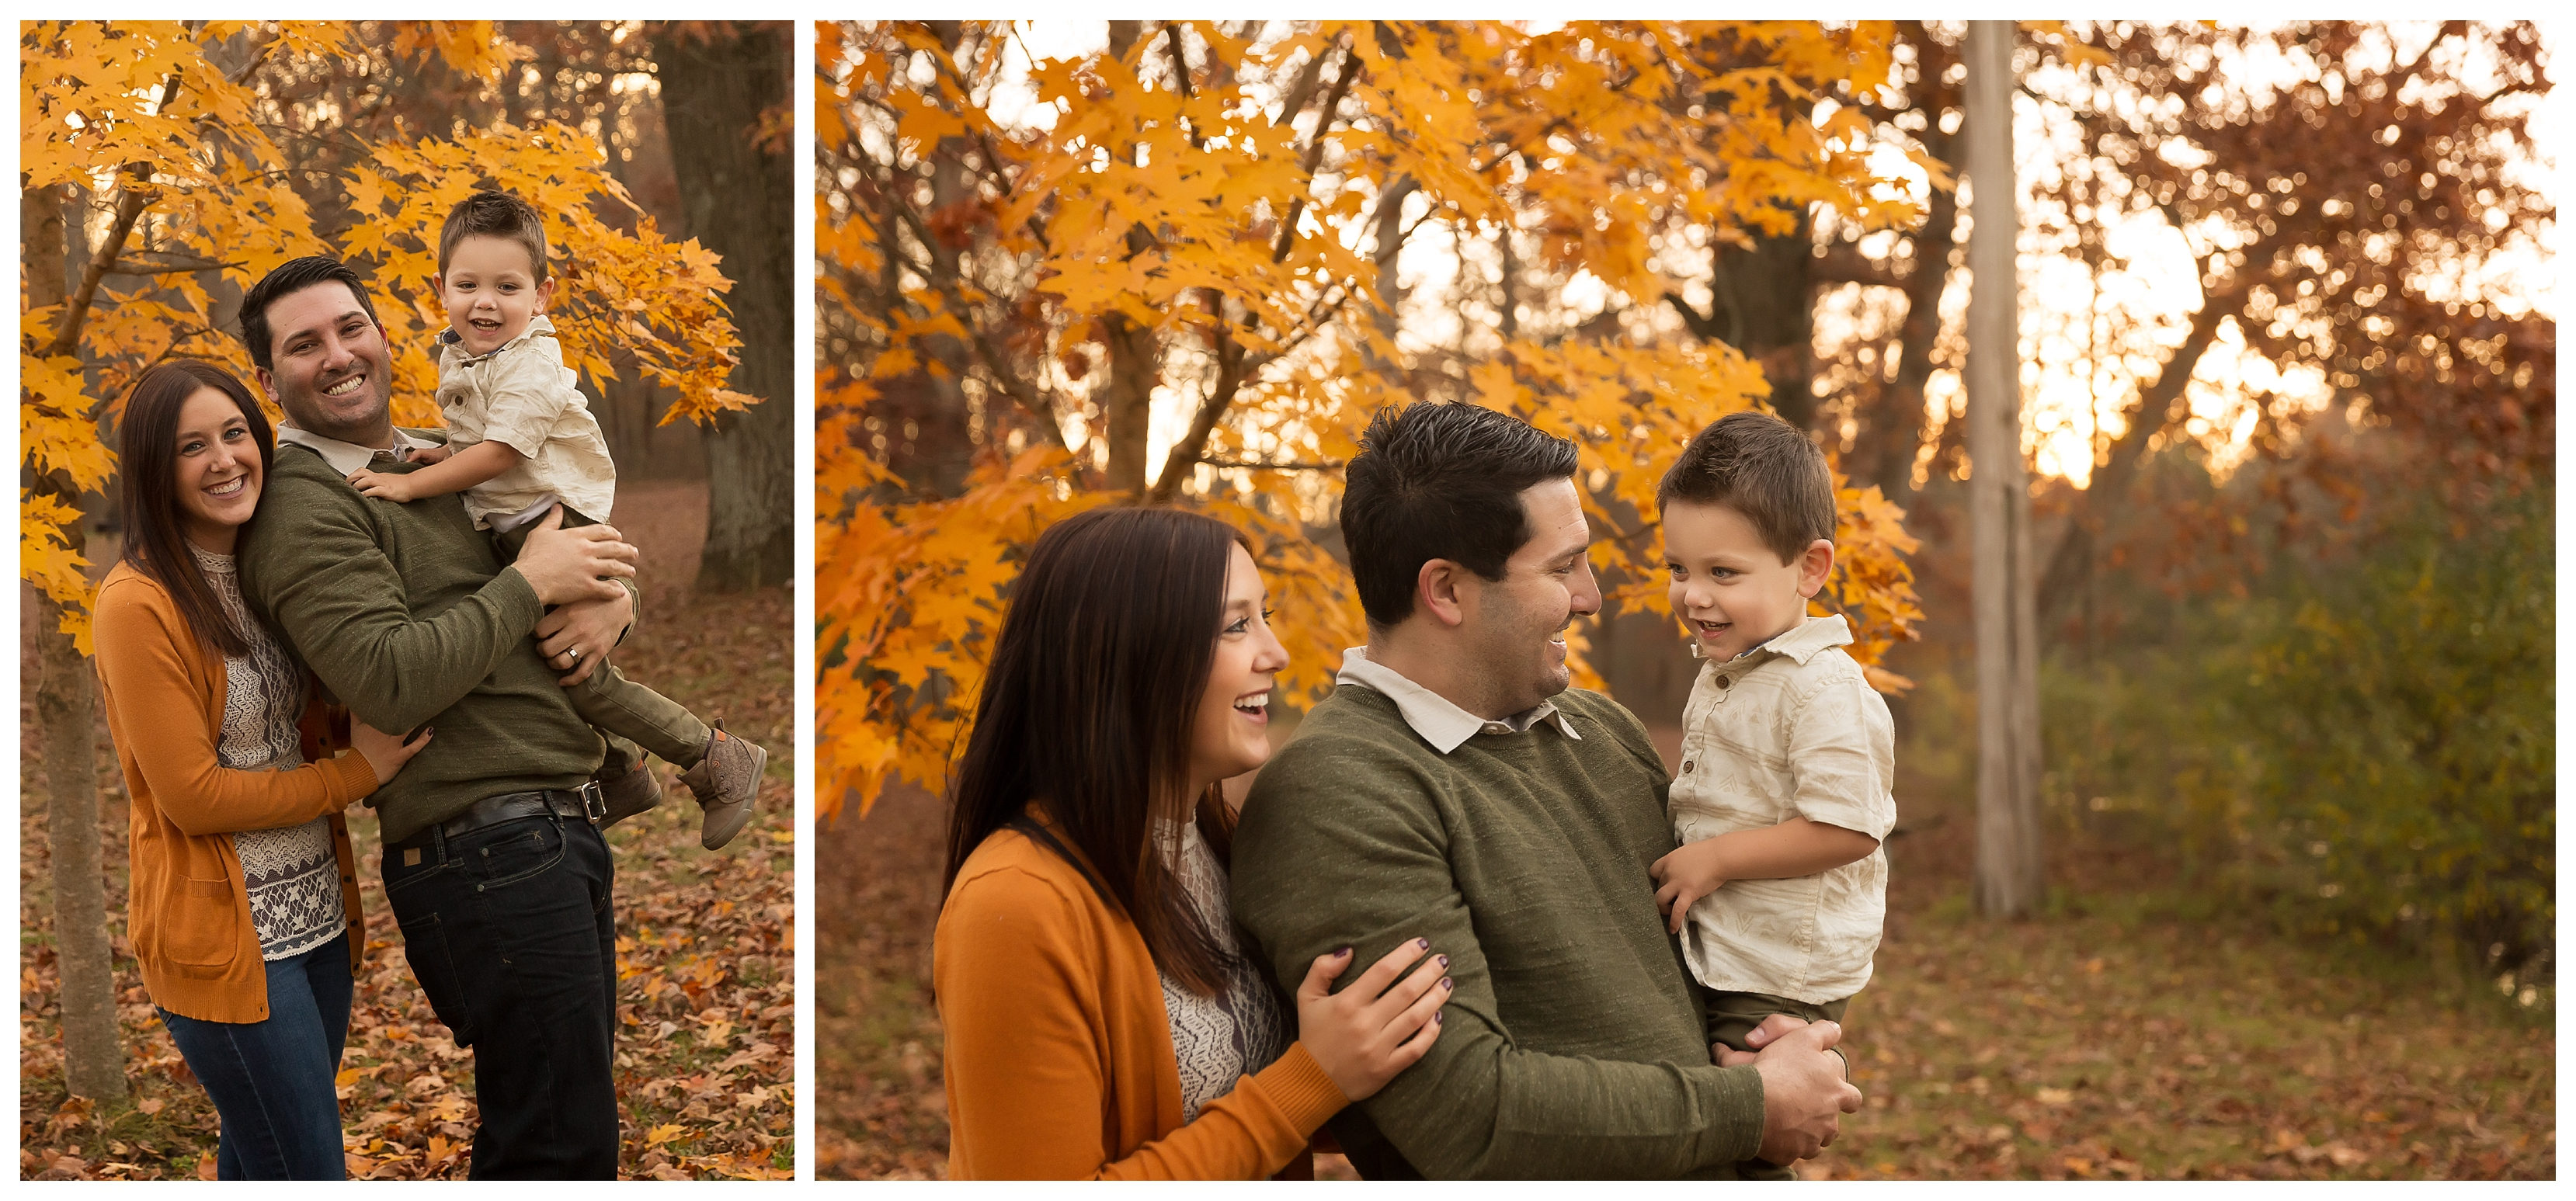 Their Last Fall in Michigan | Ann Arbor Artistic Family Photographer